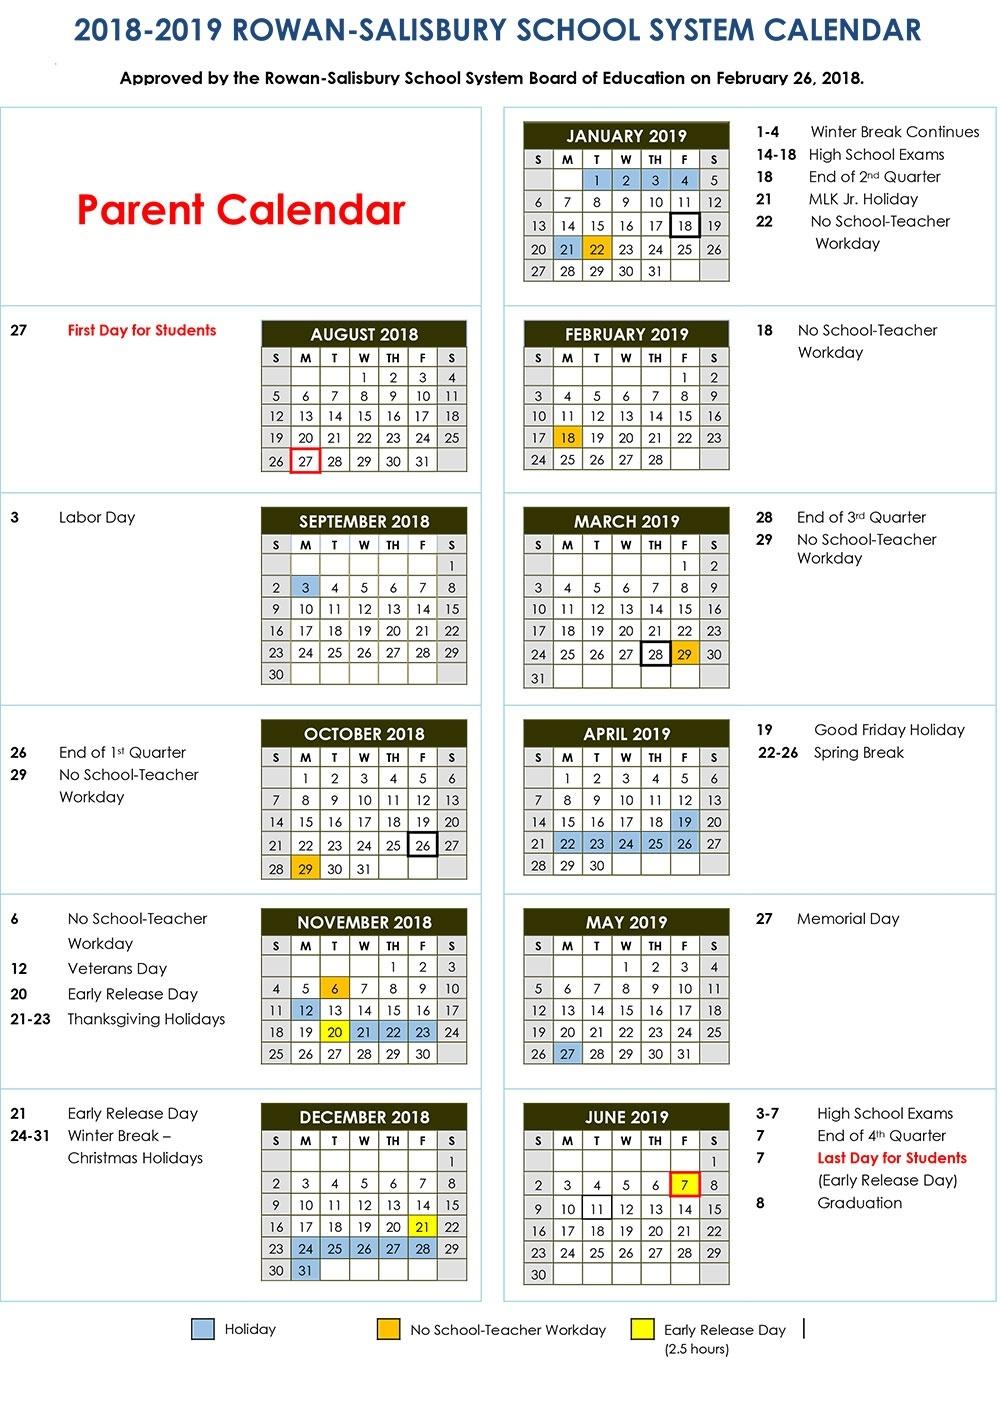 2018-2019 Calendars | Rss Post - Rowan-Salisbury Schools_District 7 School Calendar